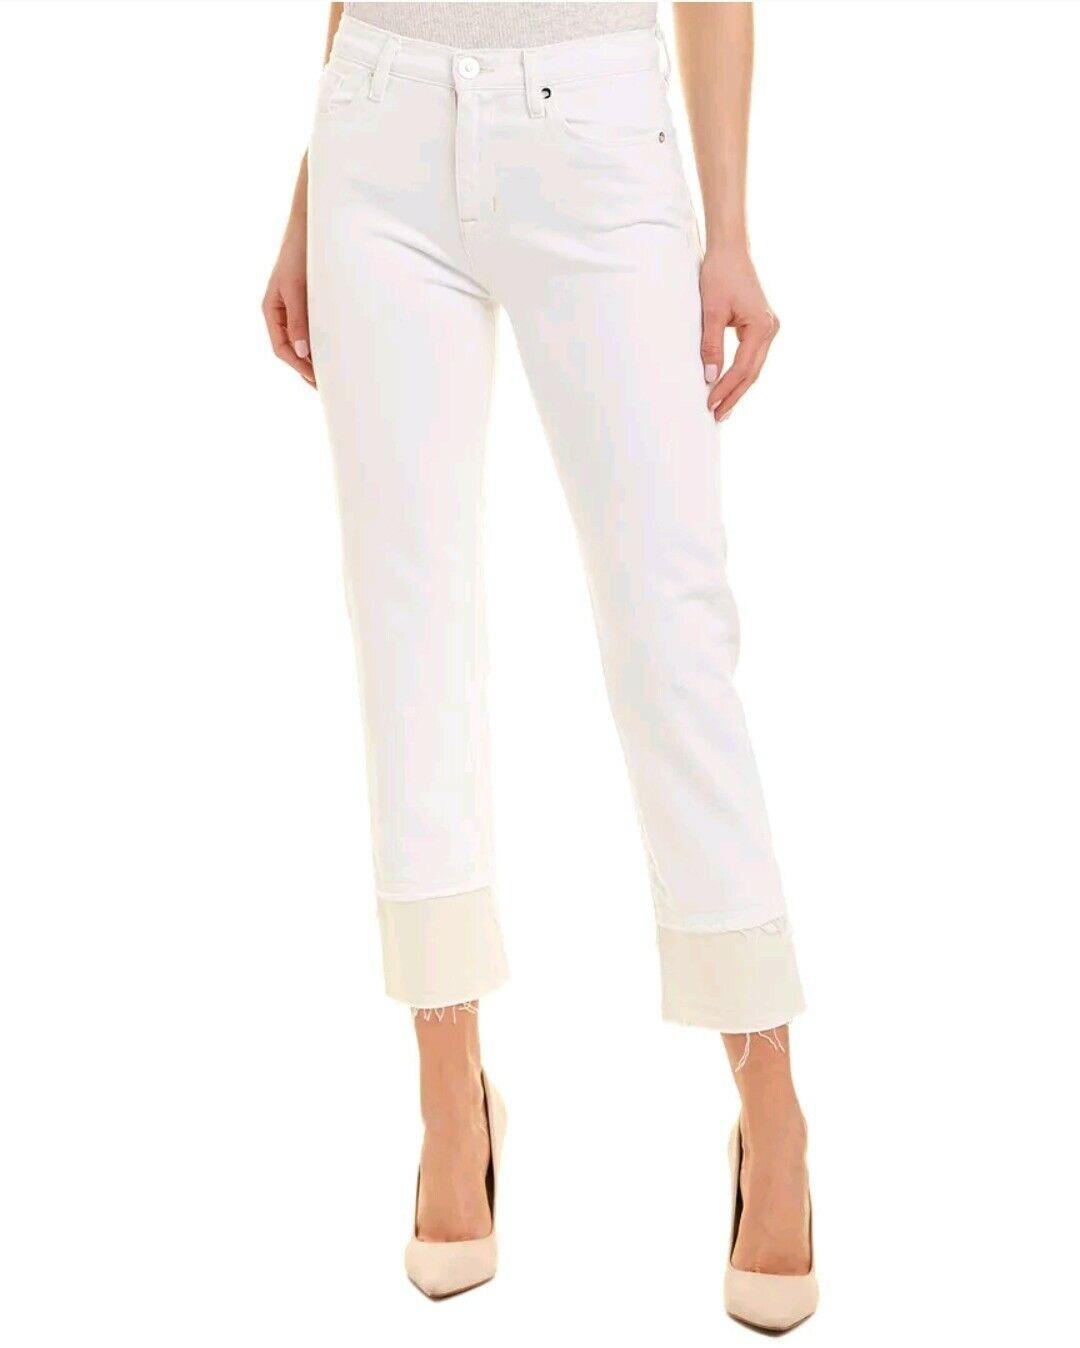 HUDSON Zooey Women 25x25 White Jeans Double Step Hem Stretch High Rise NWT